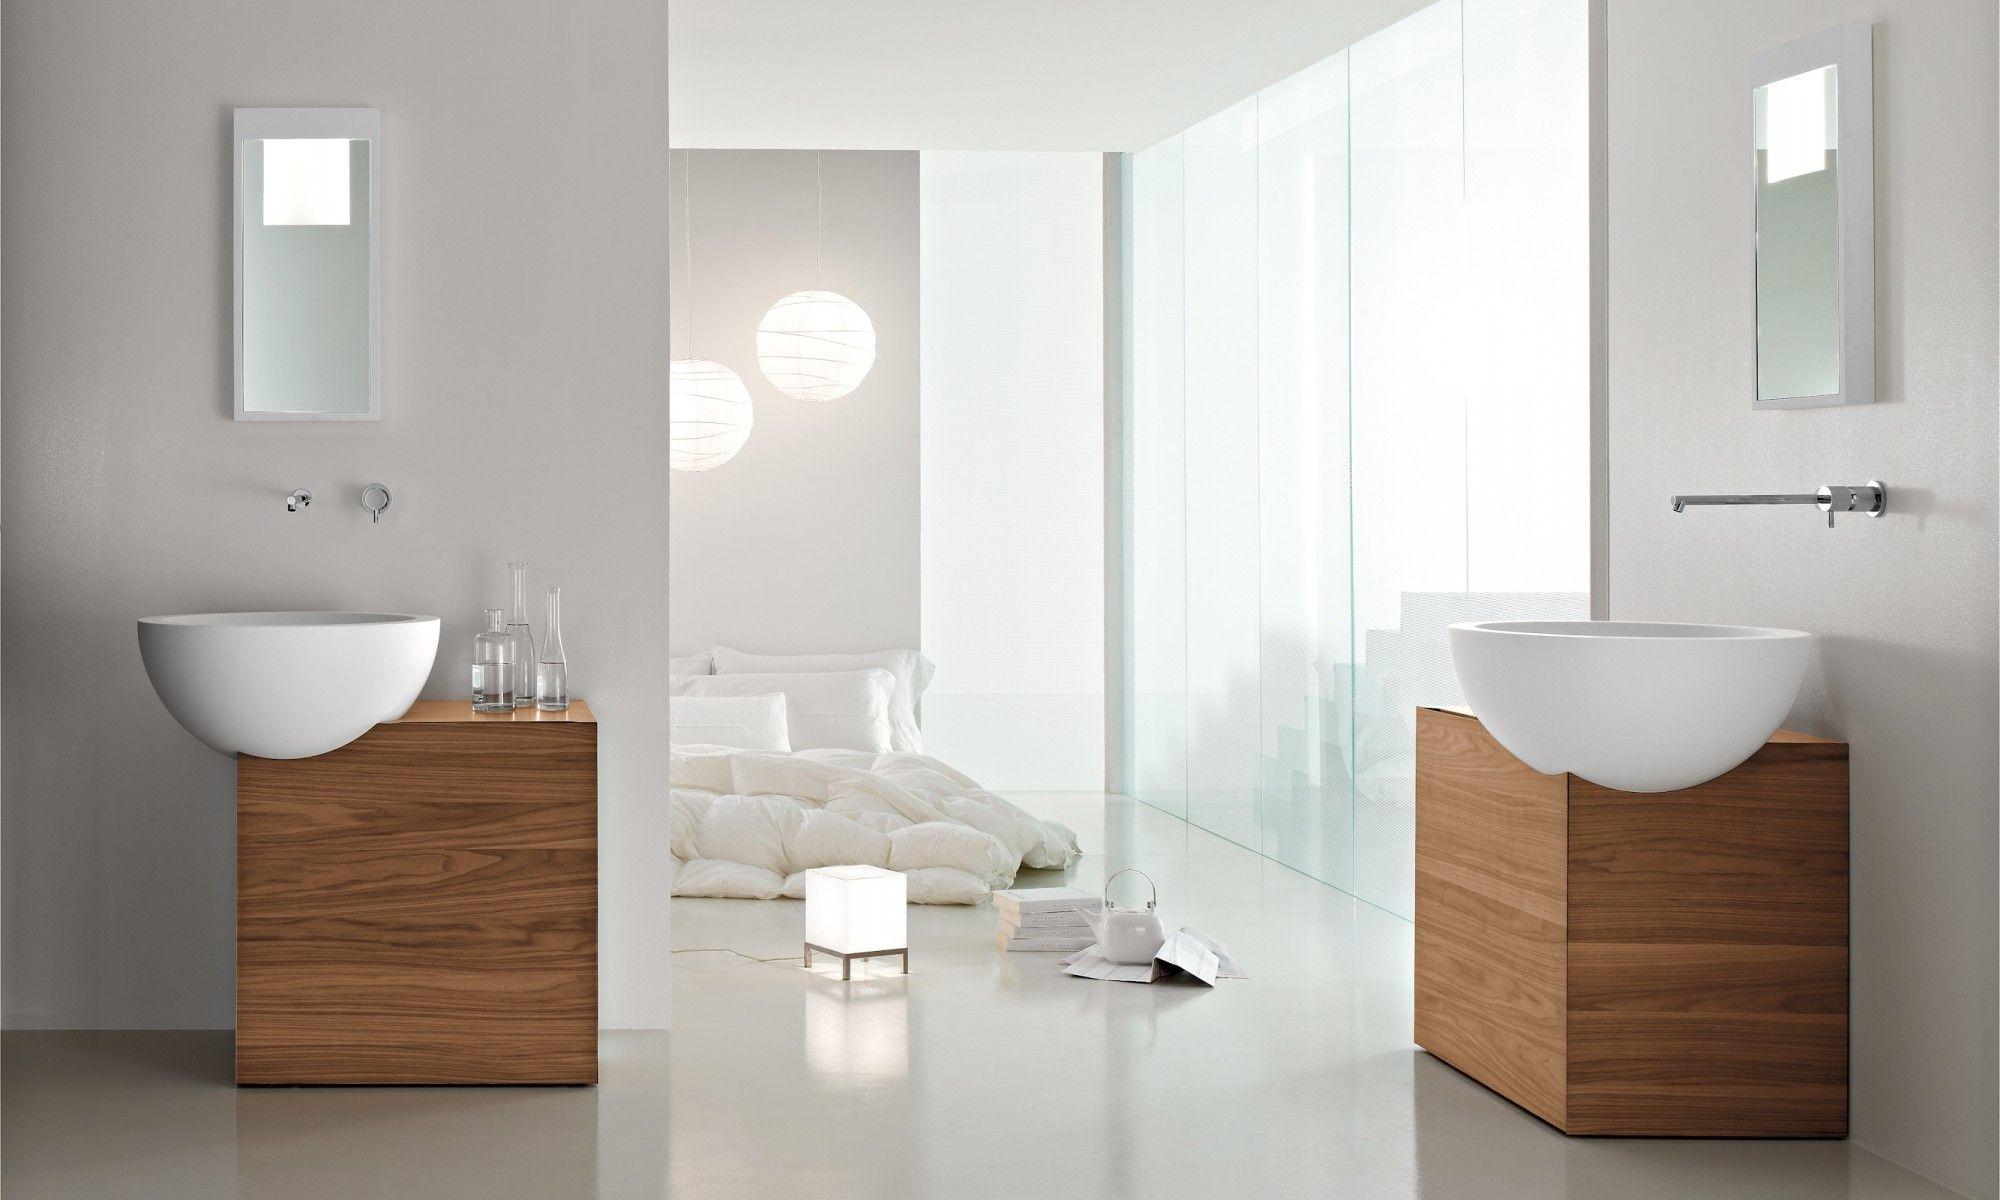 Pin by Sergio Borges on Sitio | Pinterest | Design bathroom, White ...